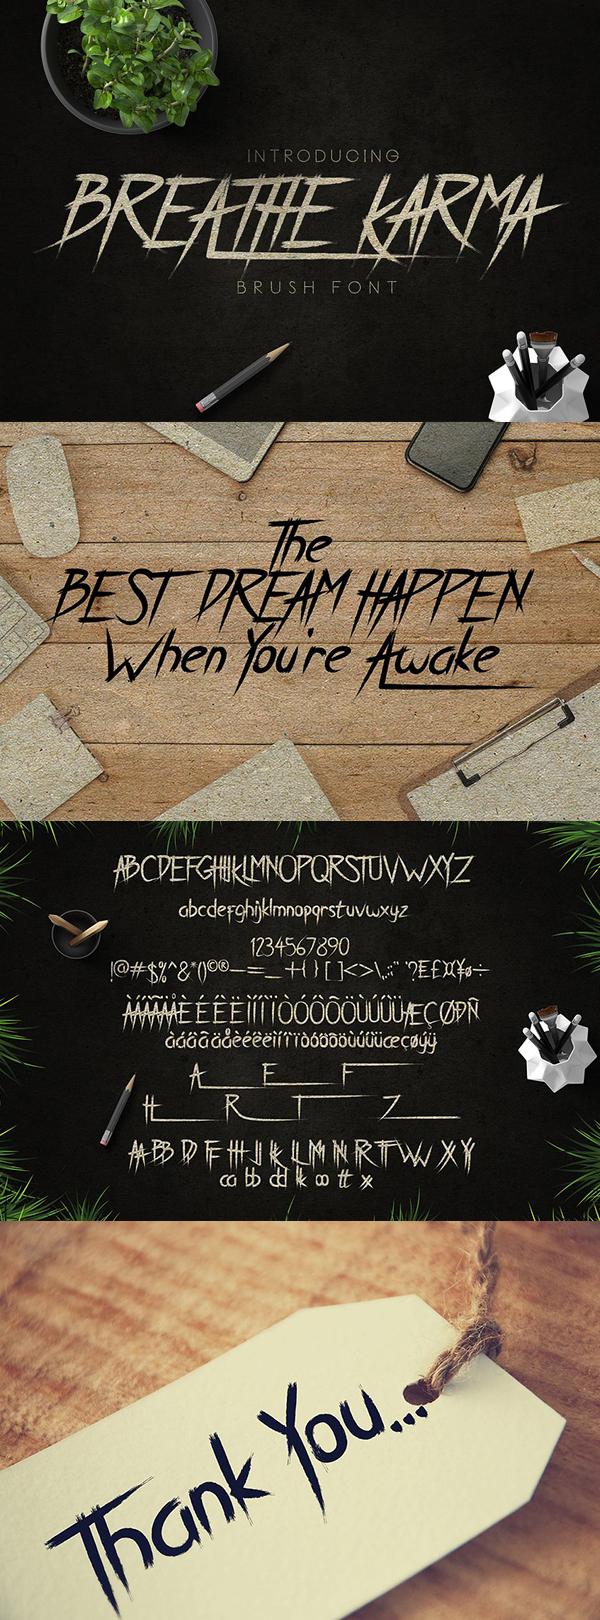 Breath Karma Free Font - 50 Best Free Brush Fonts